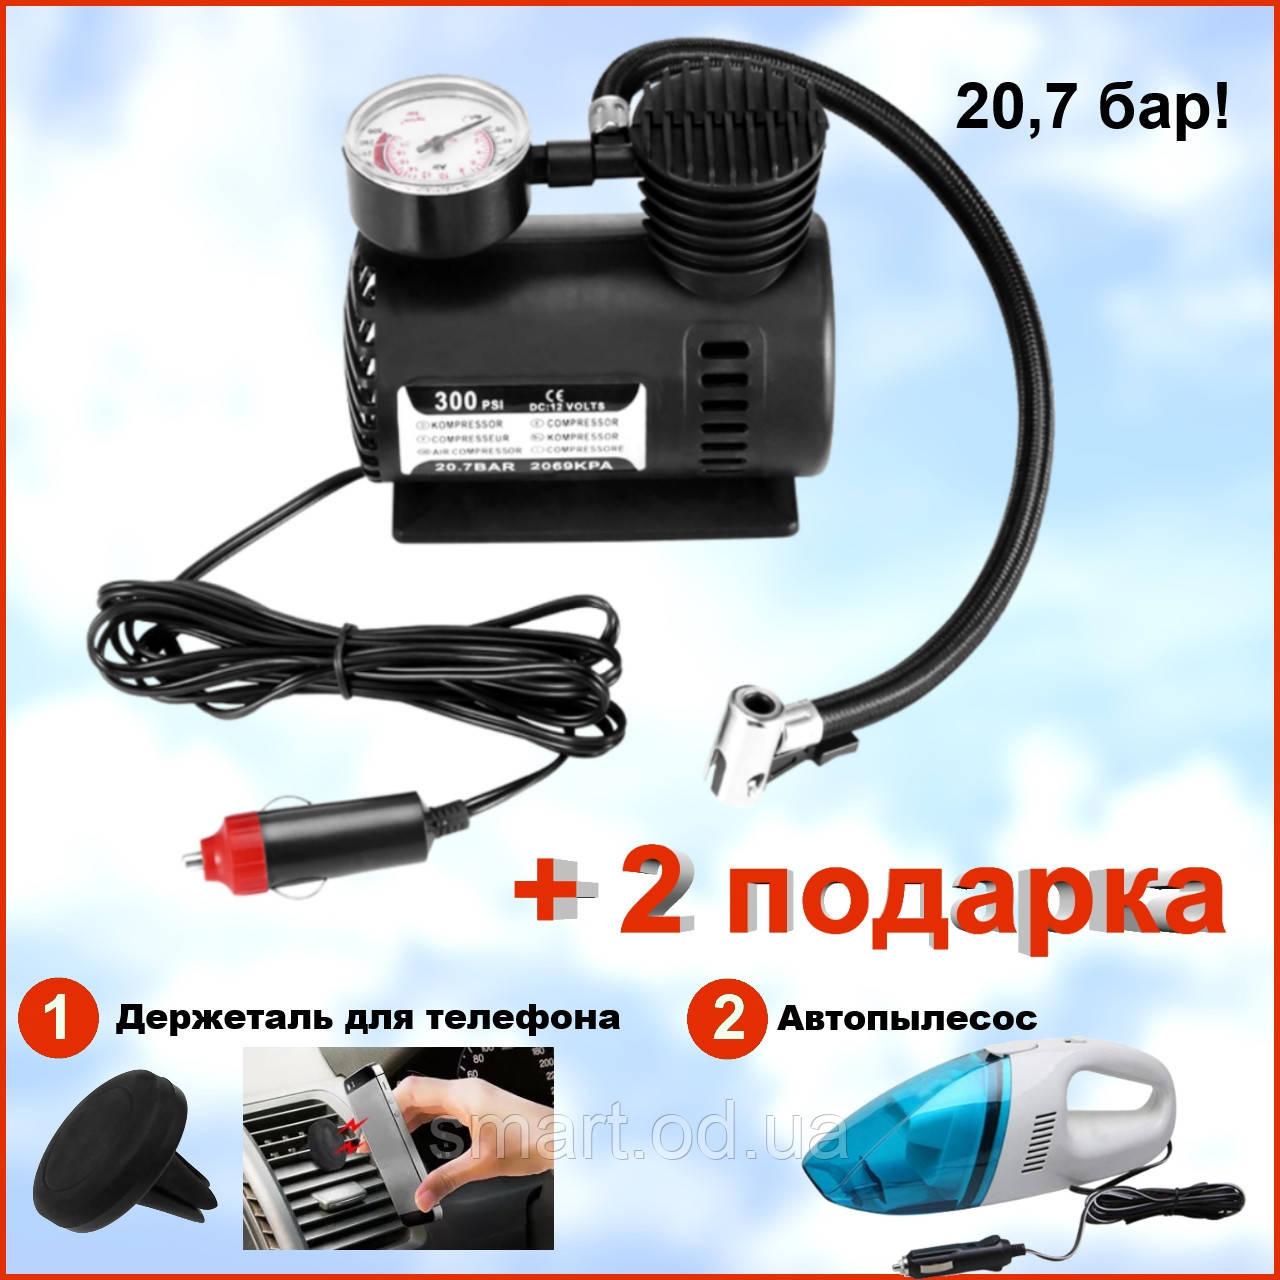 Автомобільний насос компресор Air Compressor